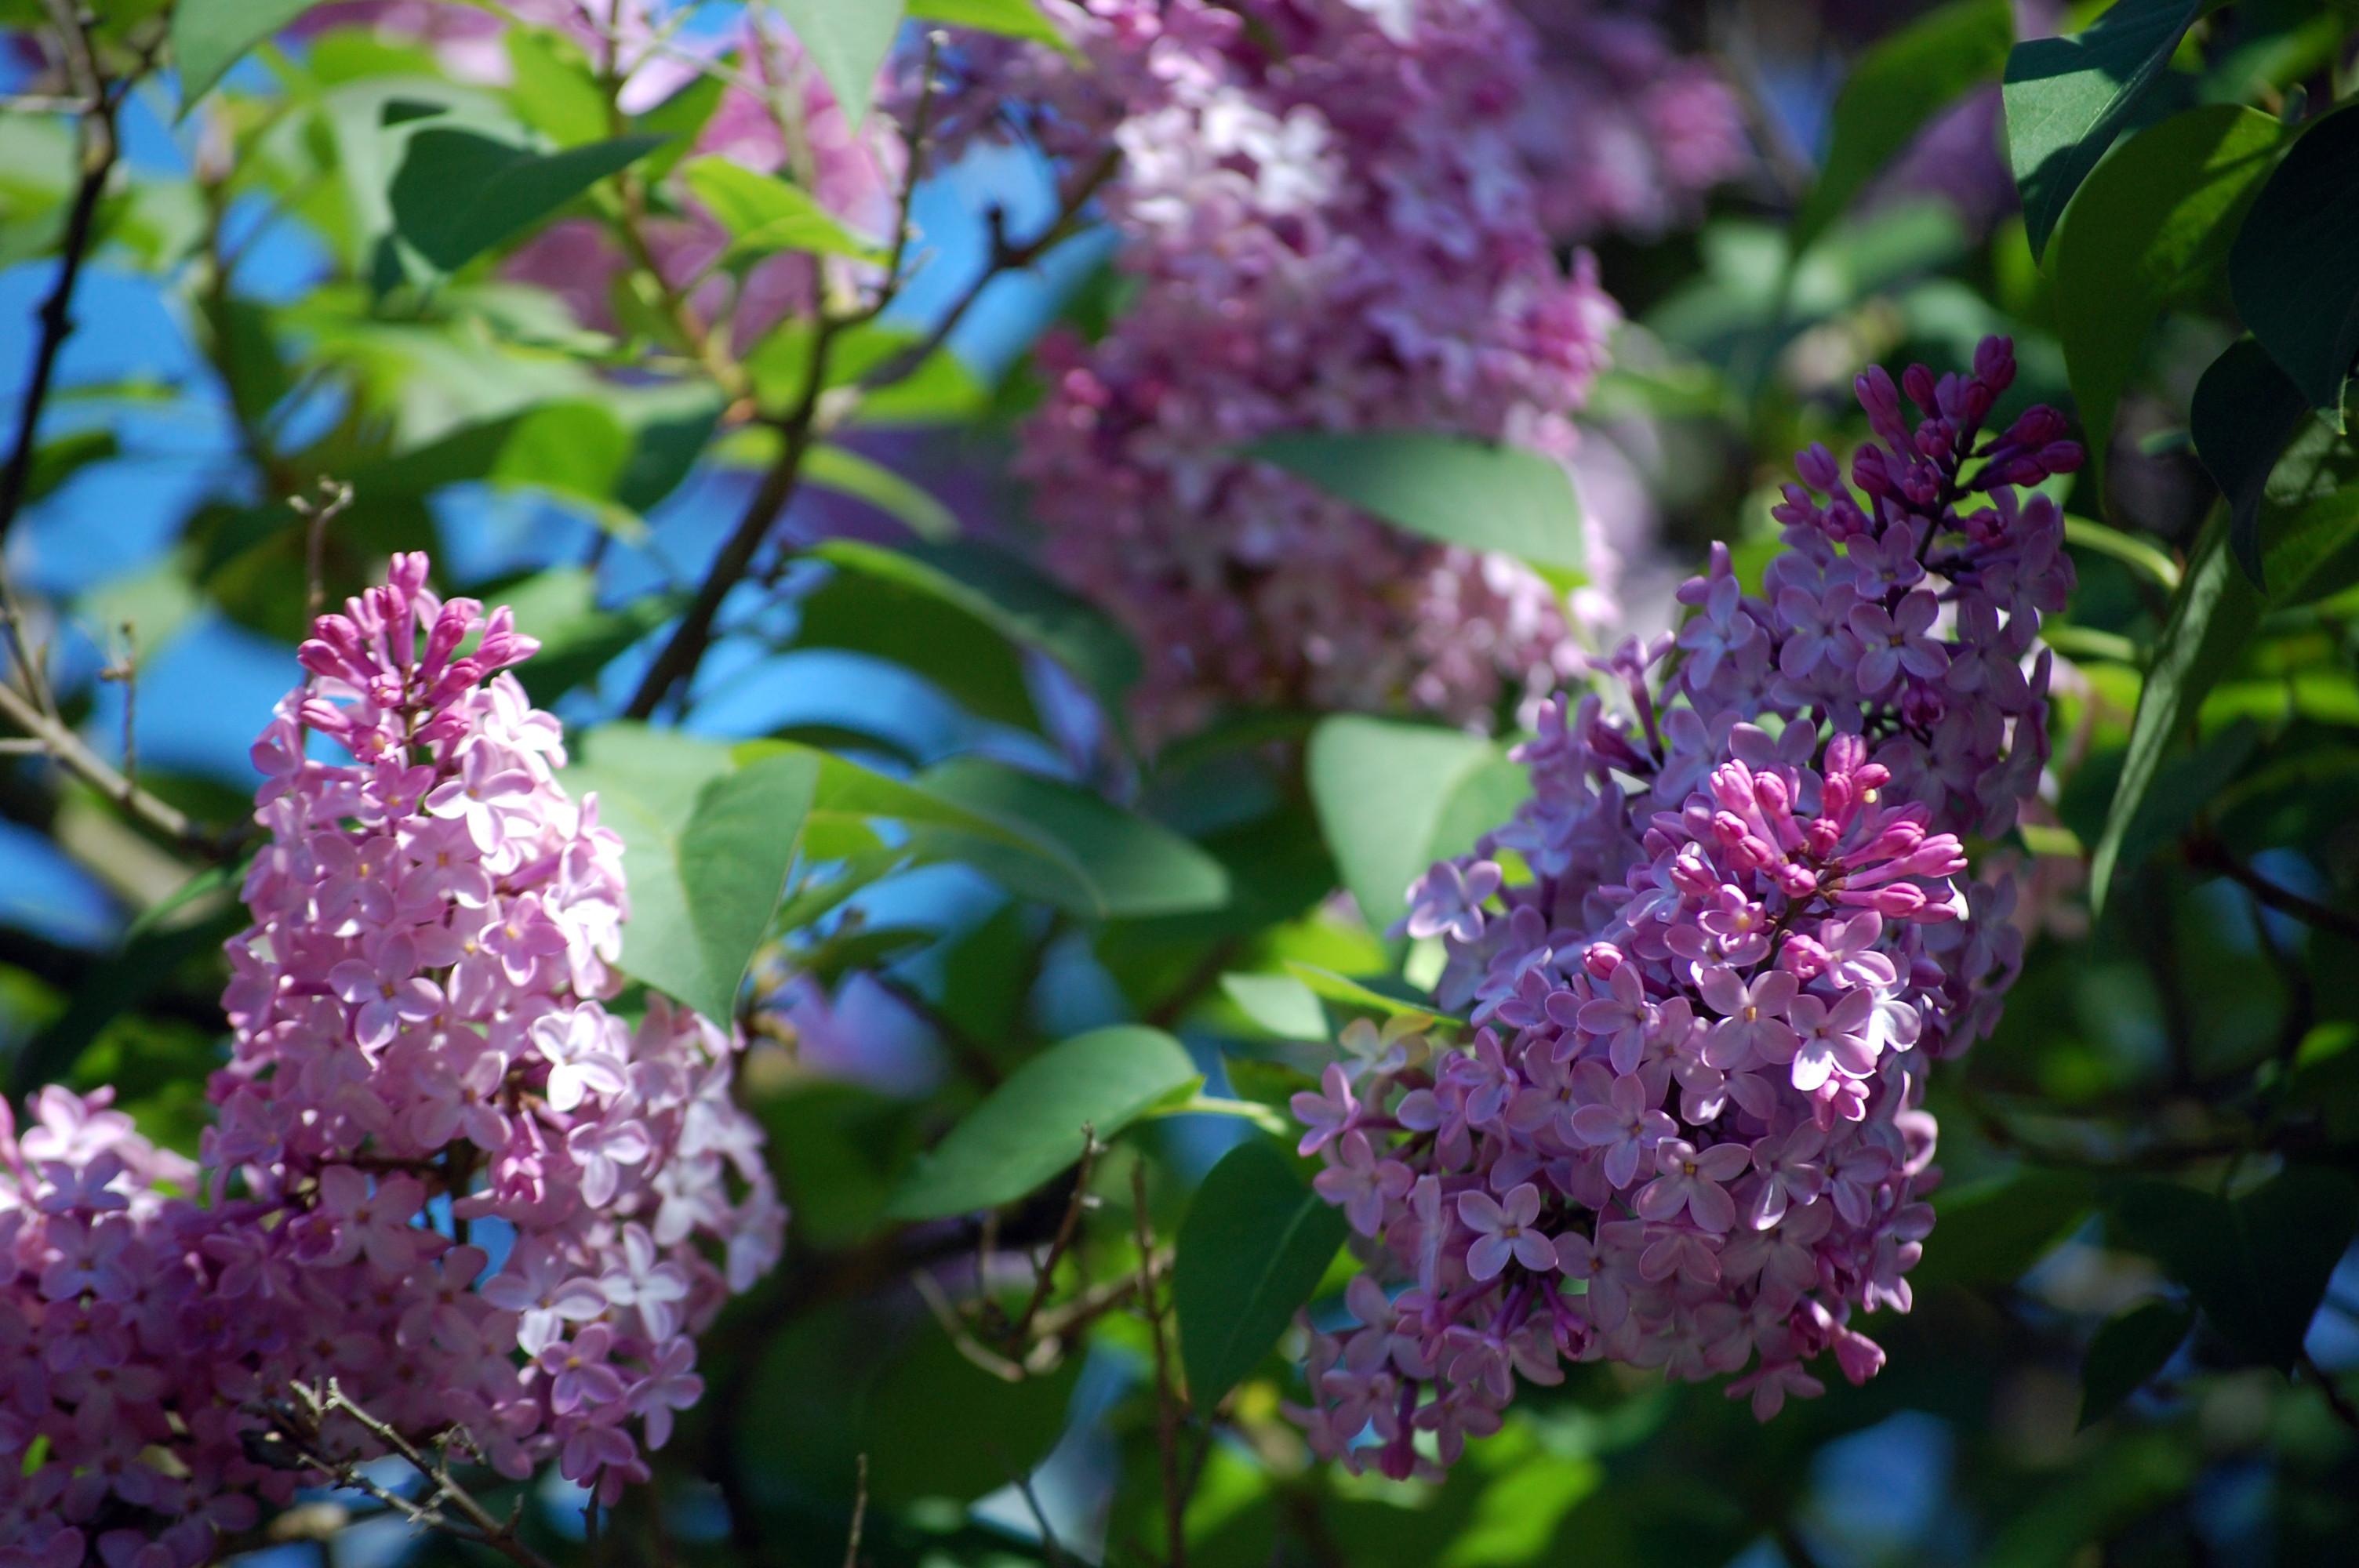 Growing A ReikiShamanic Garden